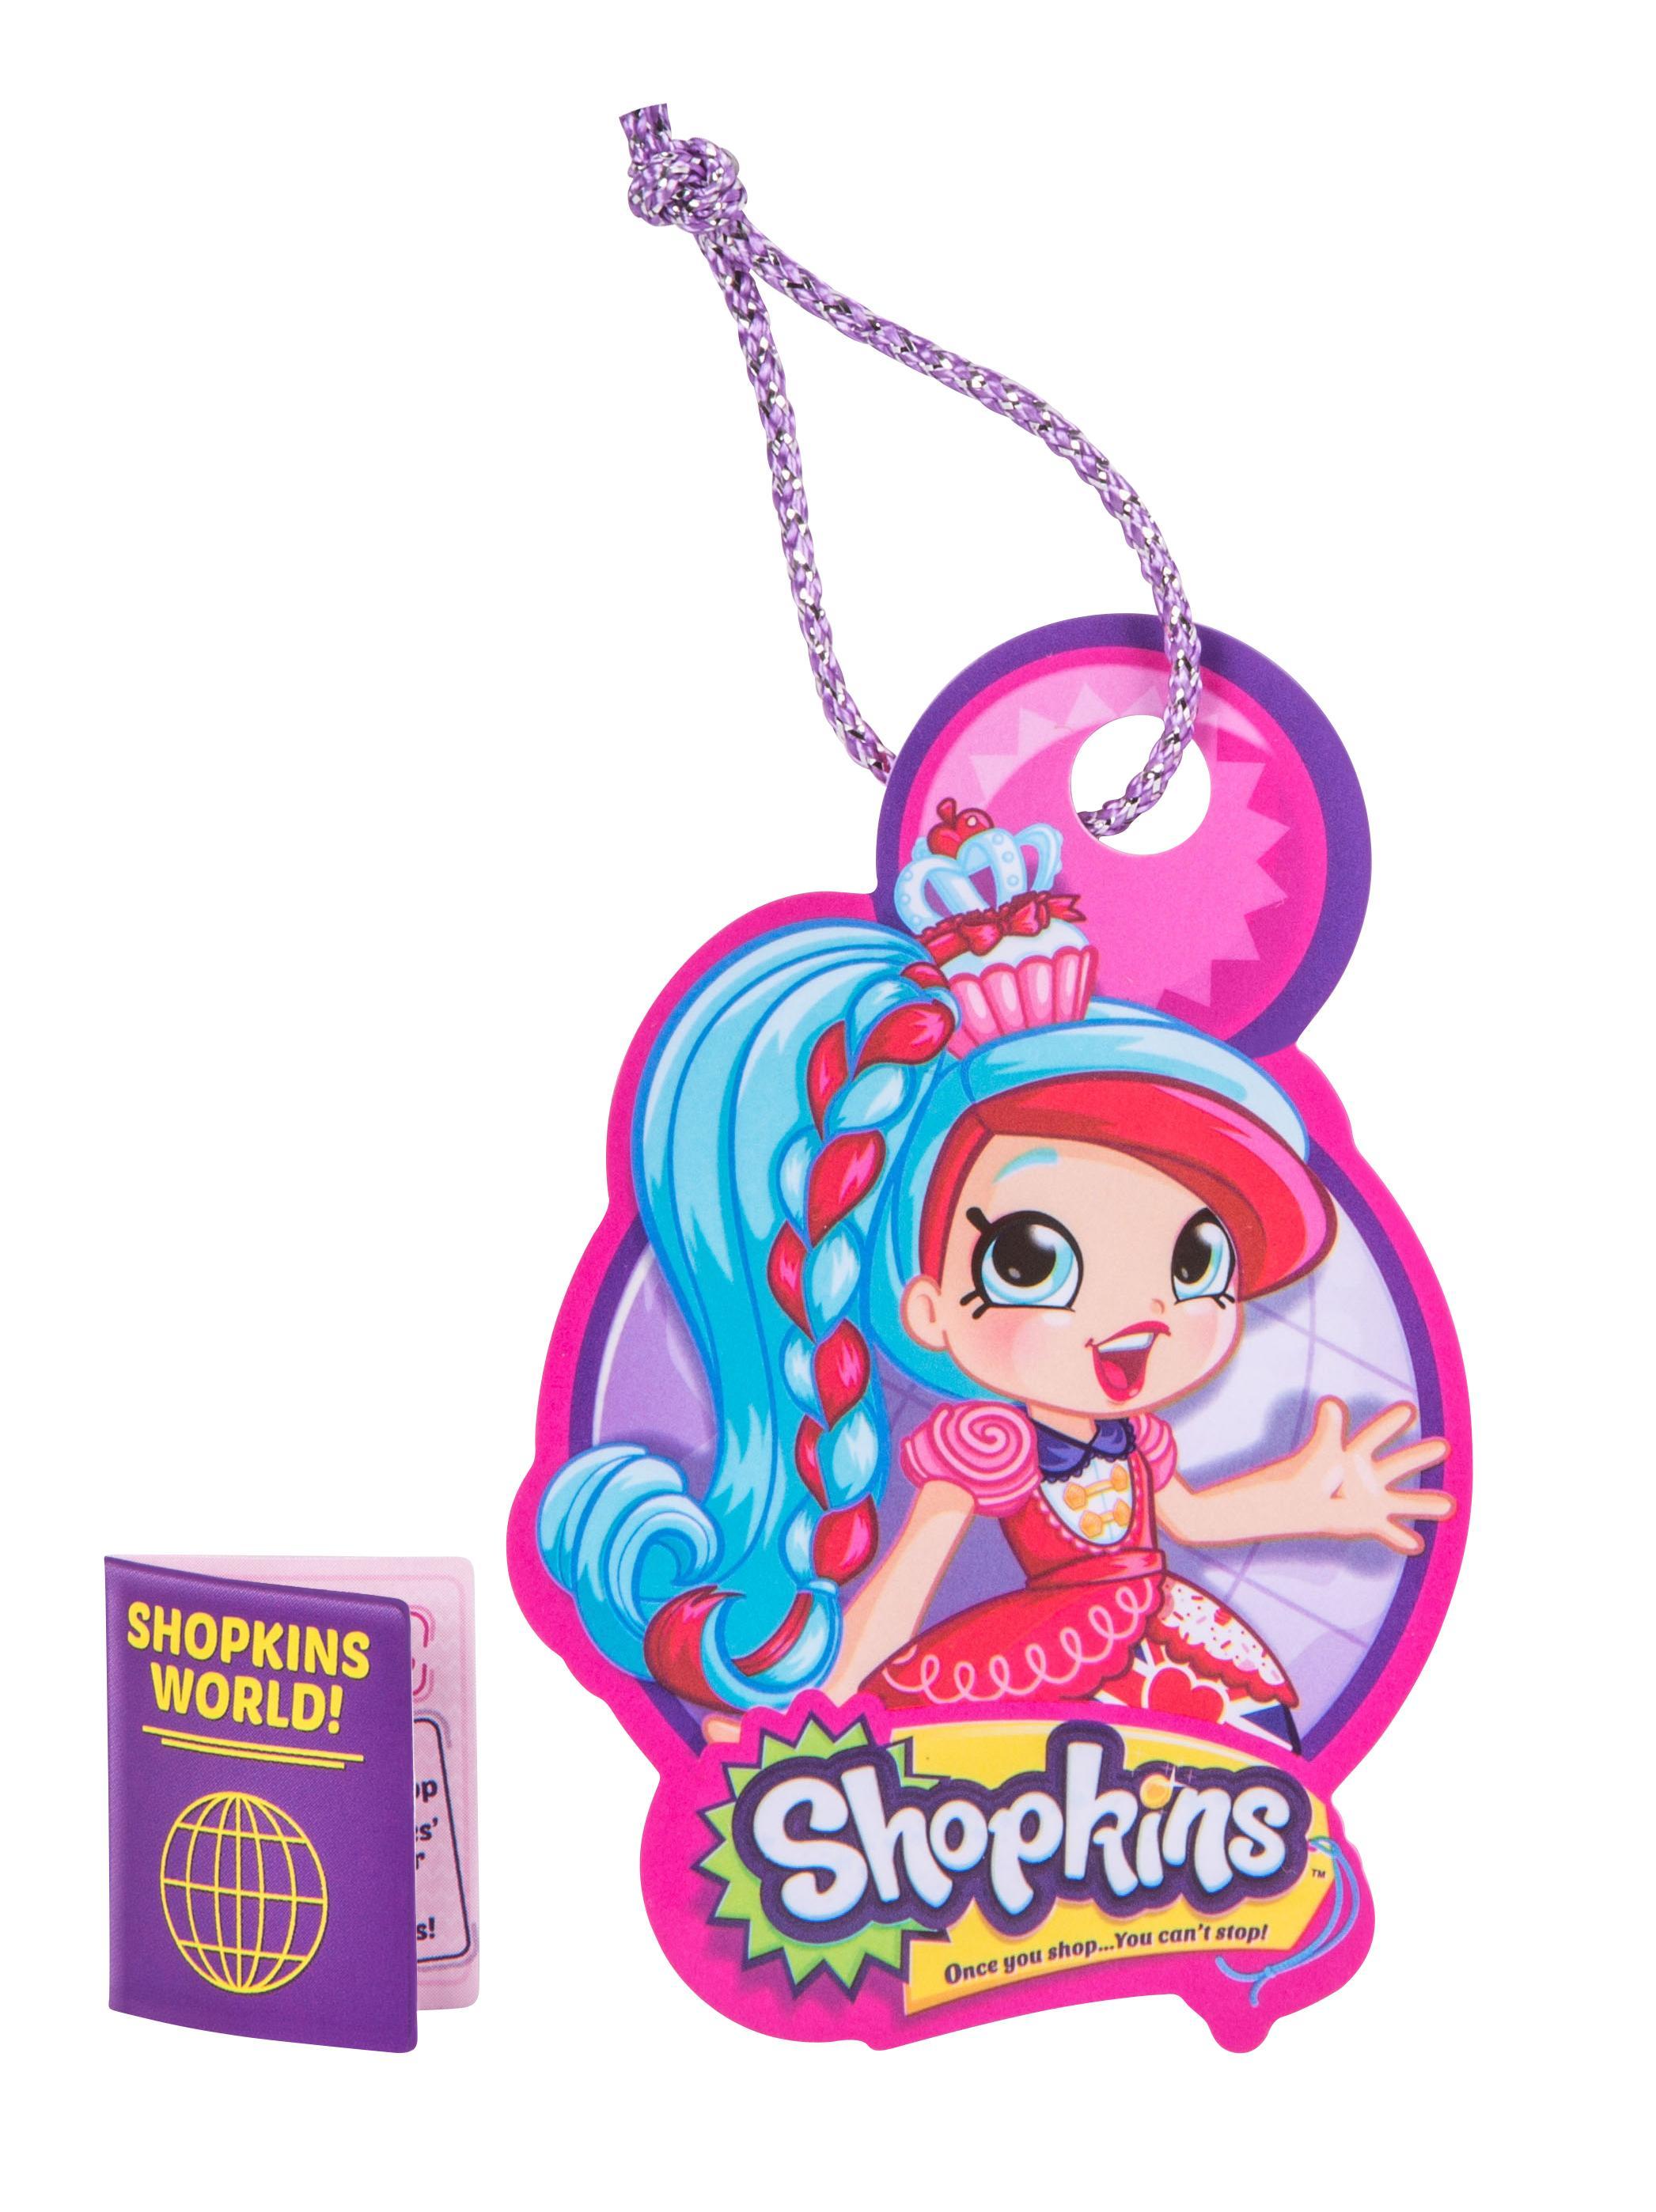 Shopkins Shoppies World Tour Themed Dolls